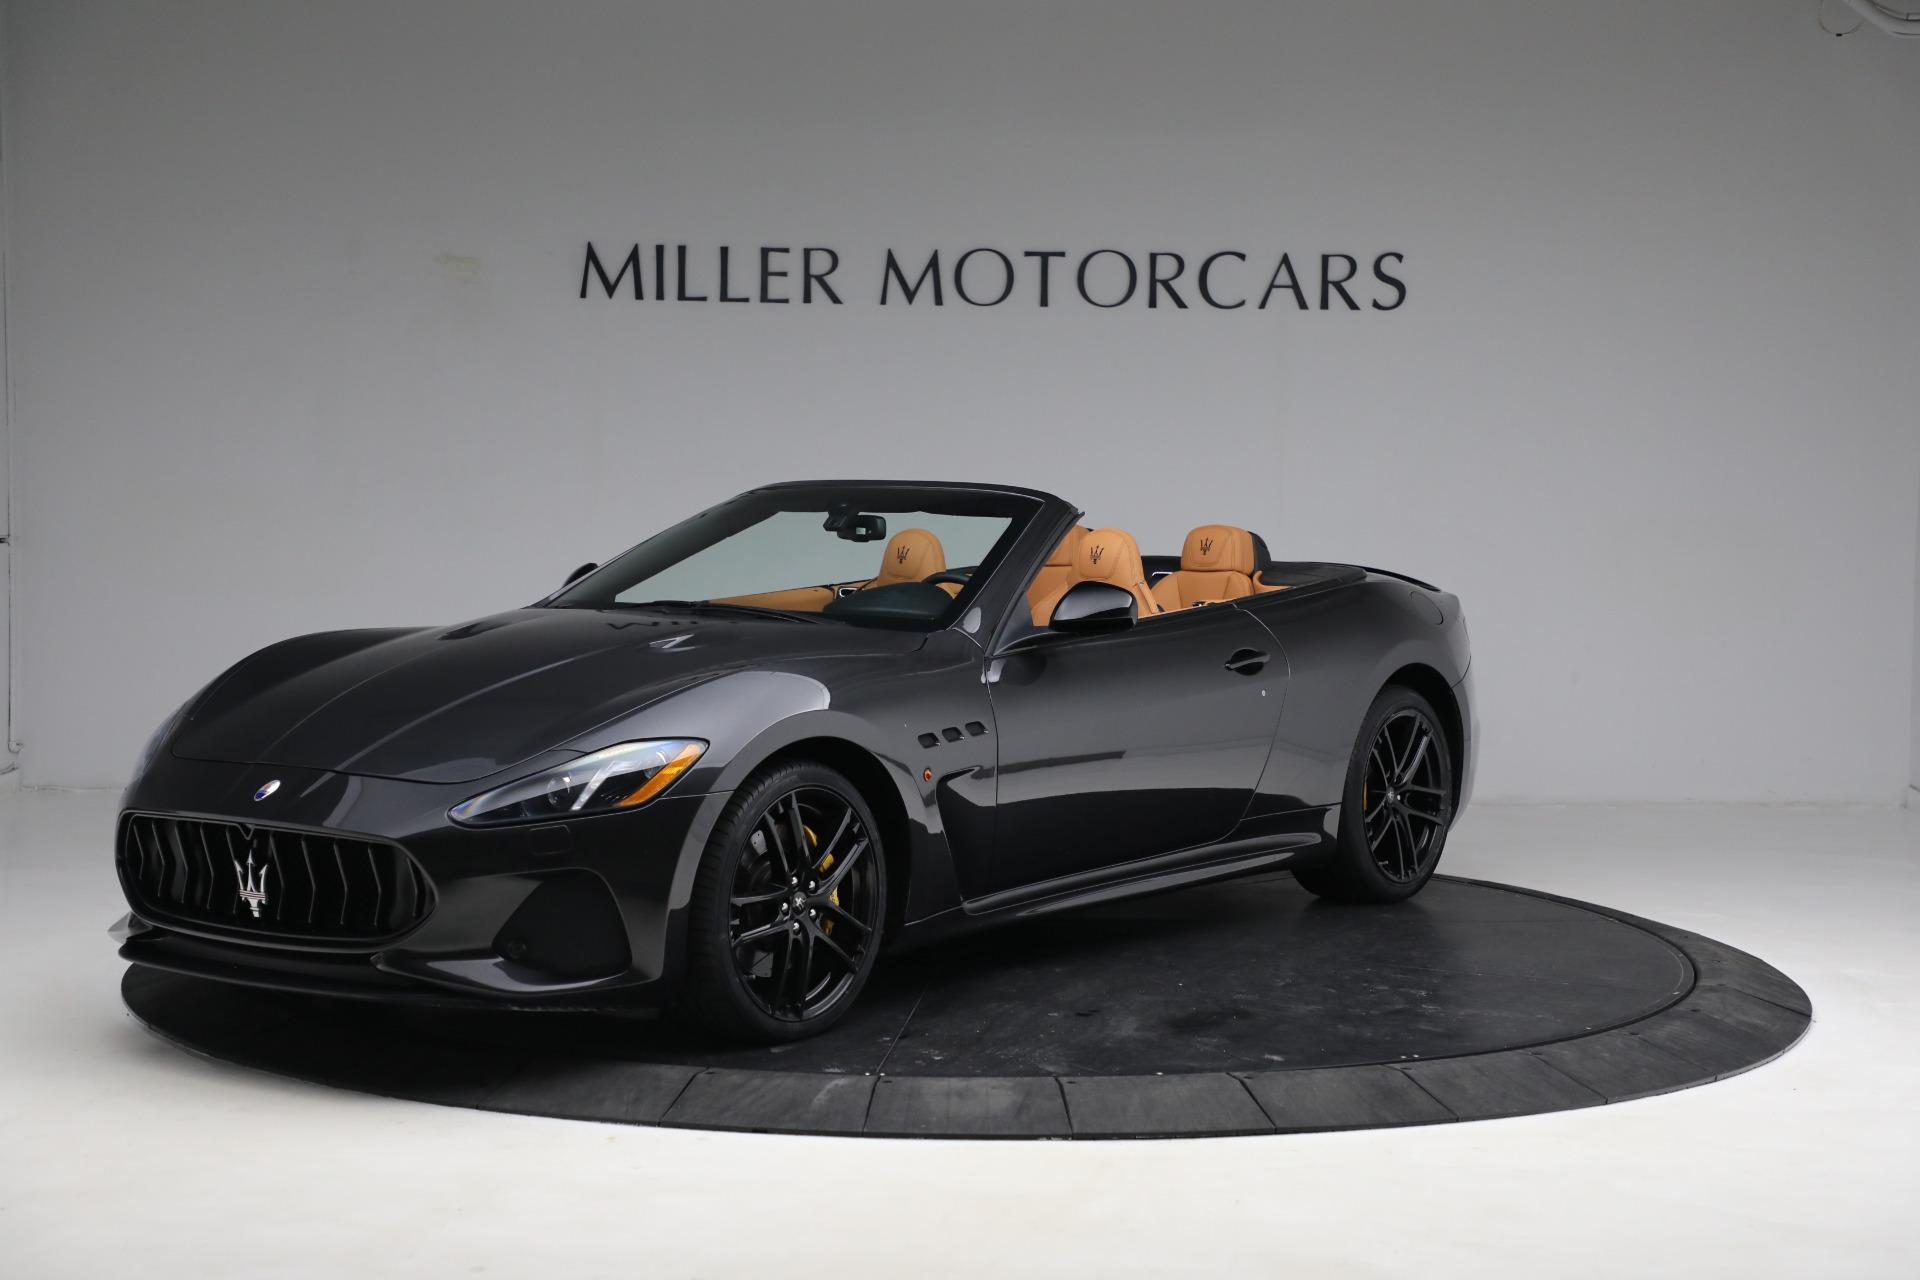 New 2019 Maserati GranTurismo MC Convertible For Sale In Westport, CT 3468_p2